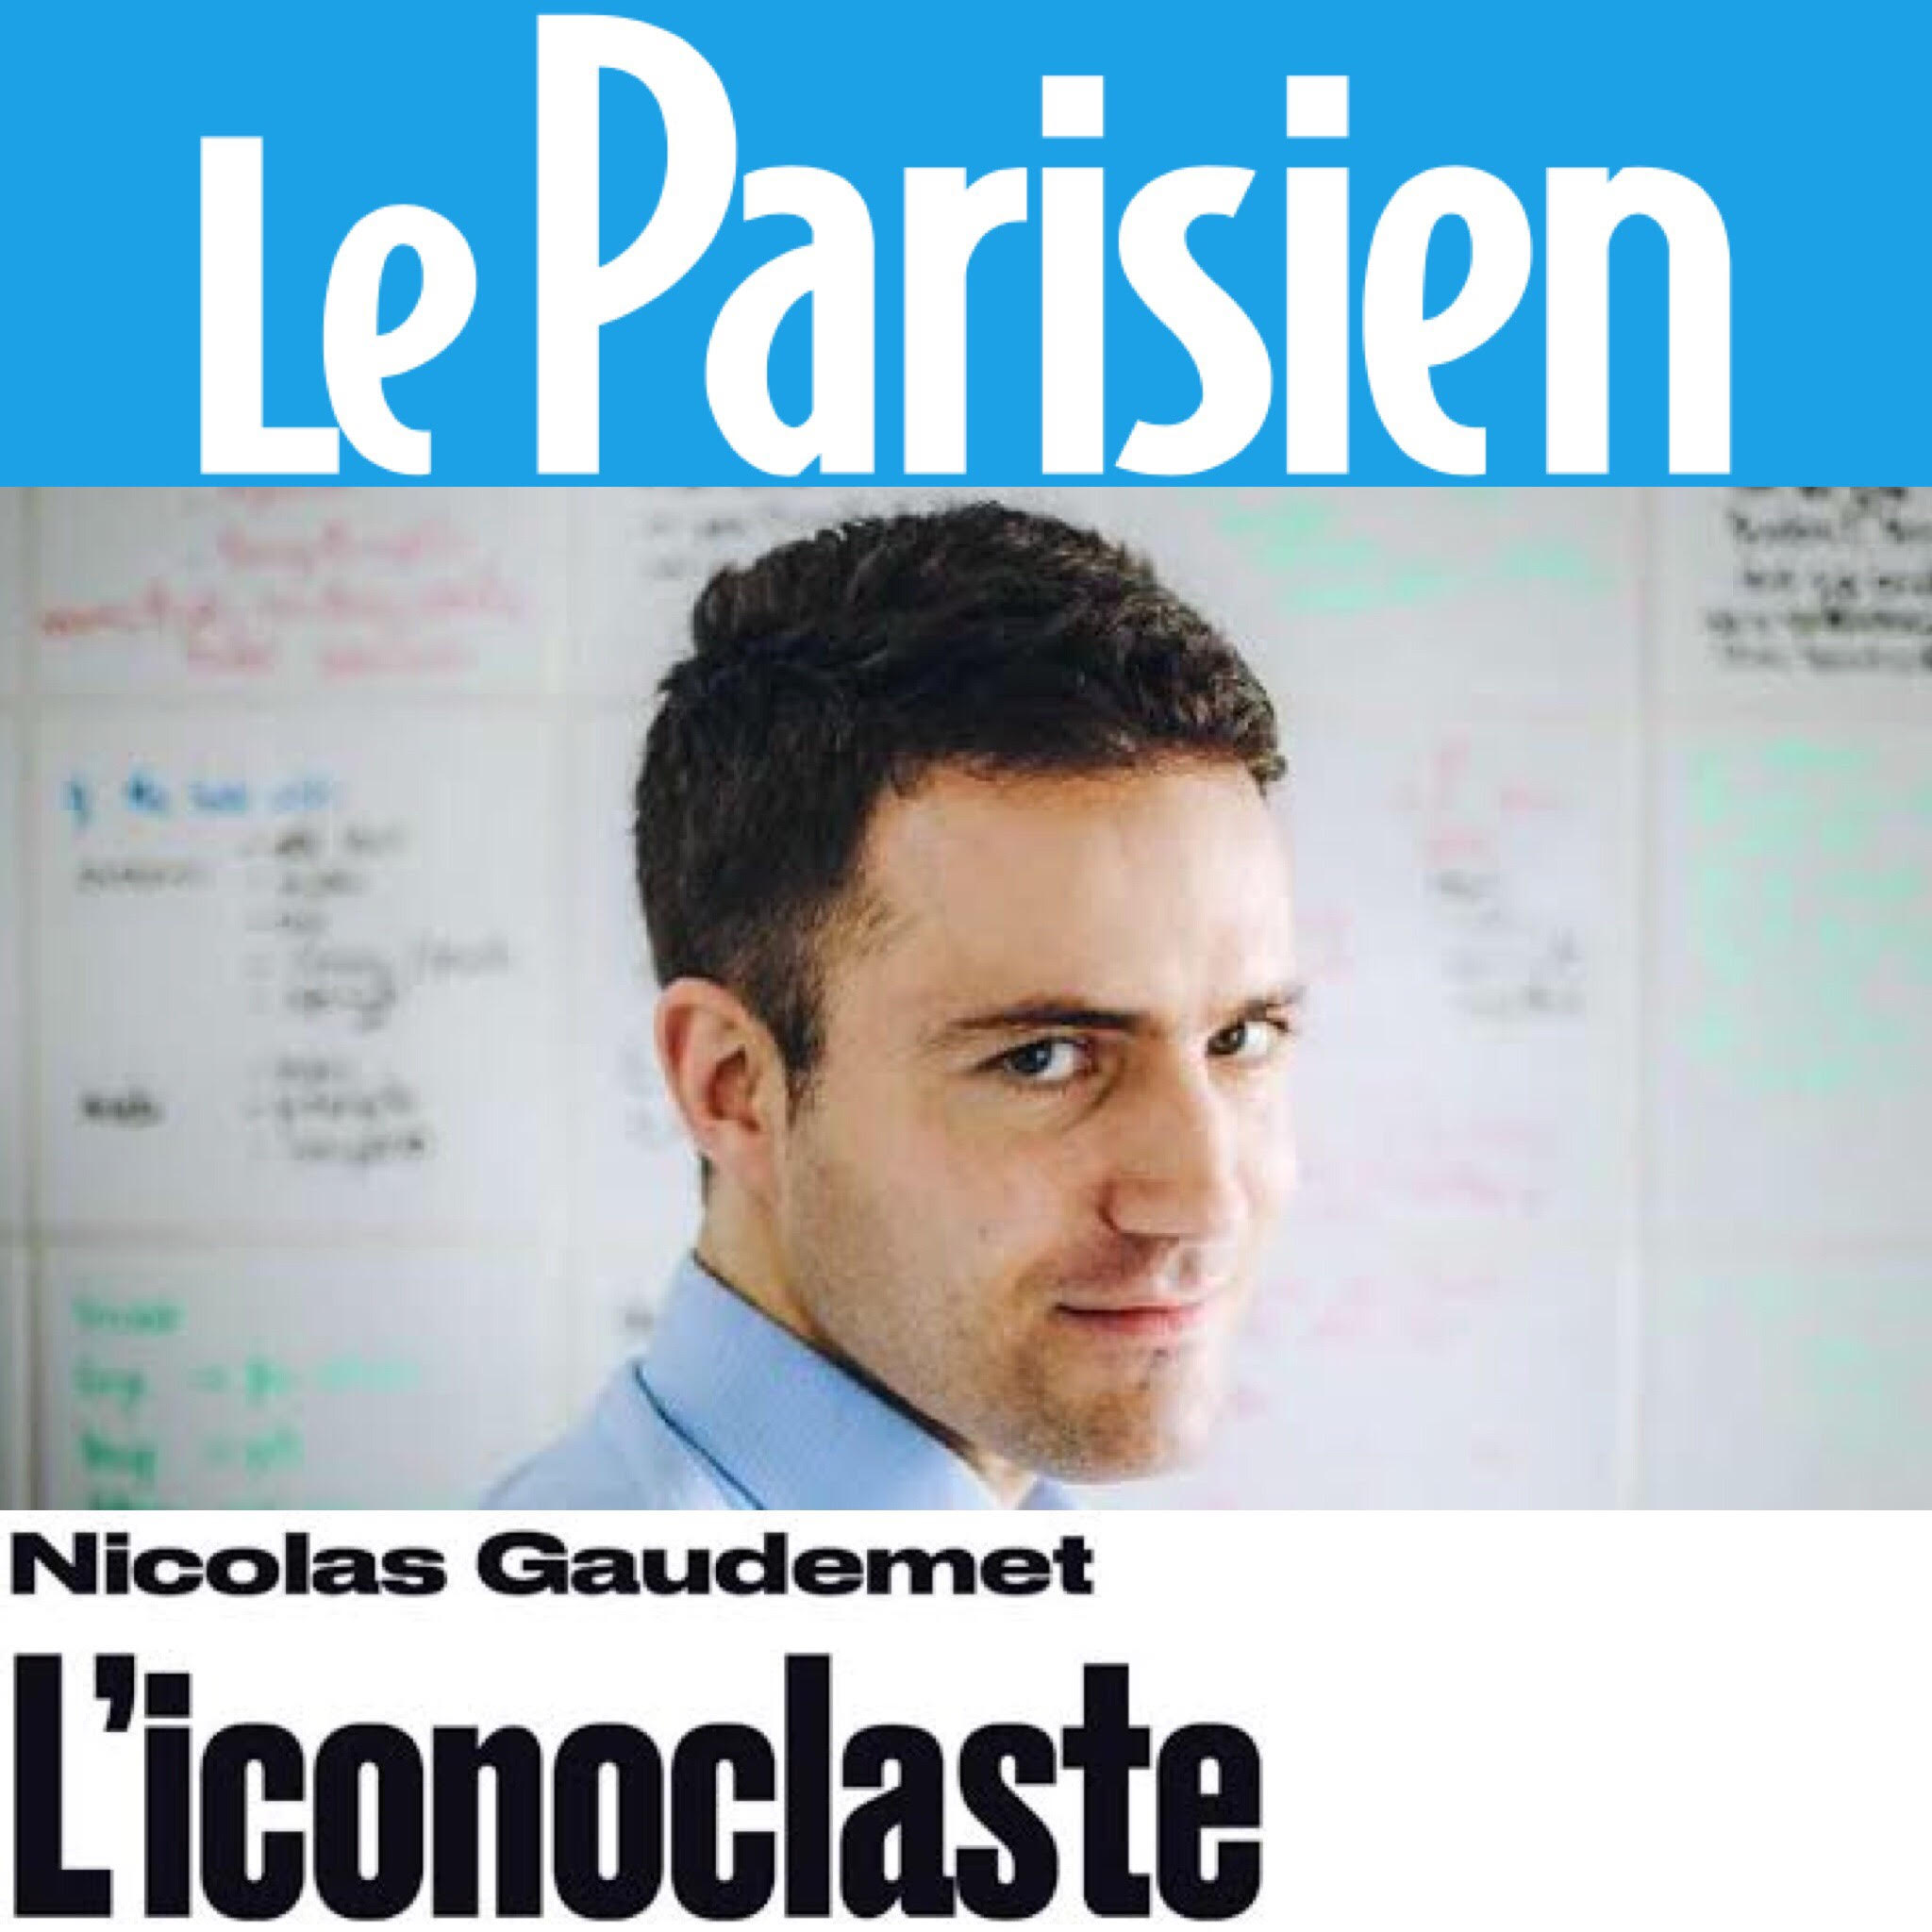 La Fin des idoles de Nicolas Gaudemet dans Le Parisien